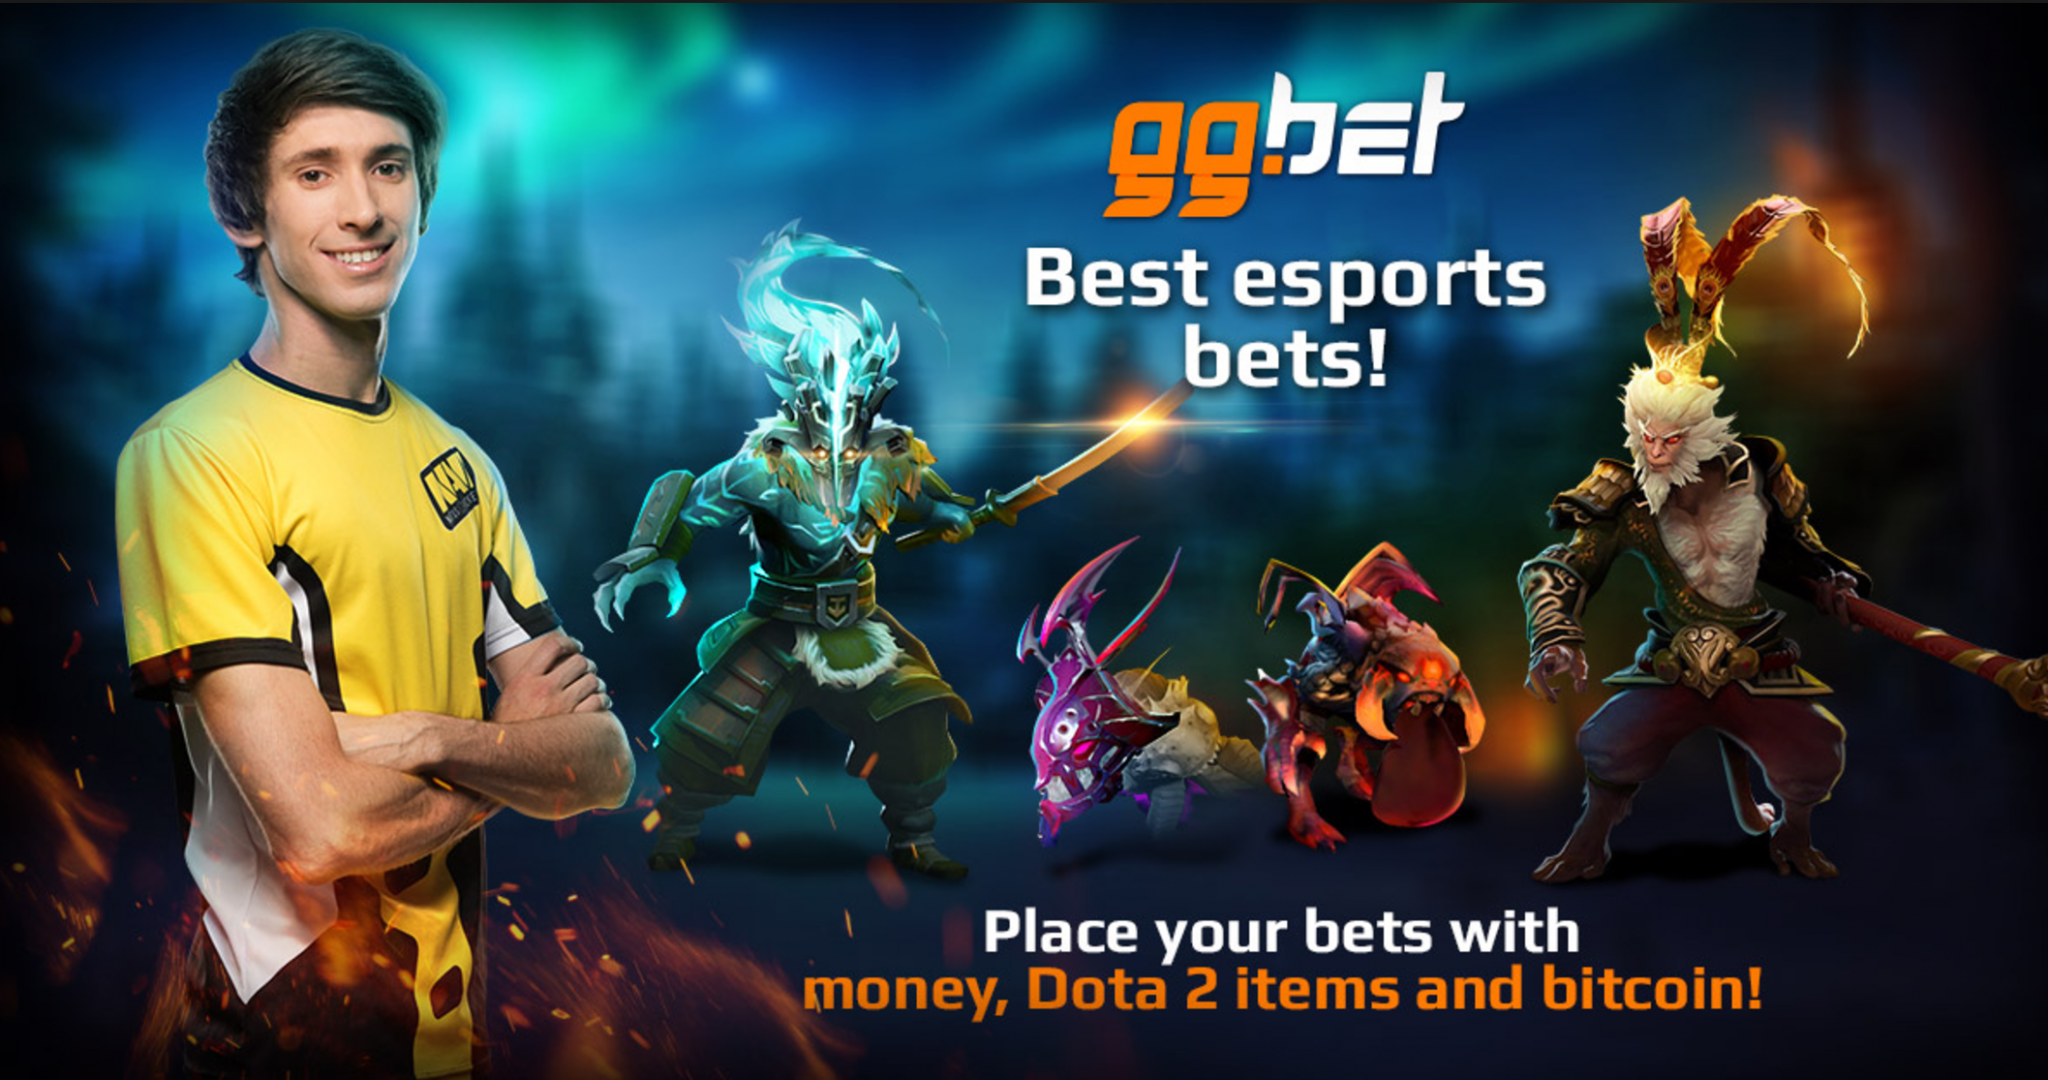 esports betting gg.bet